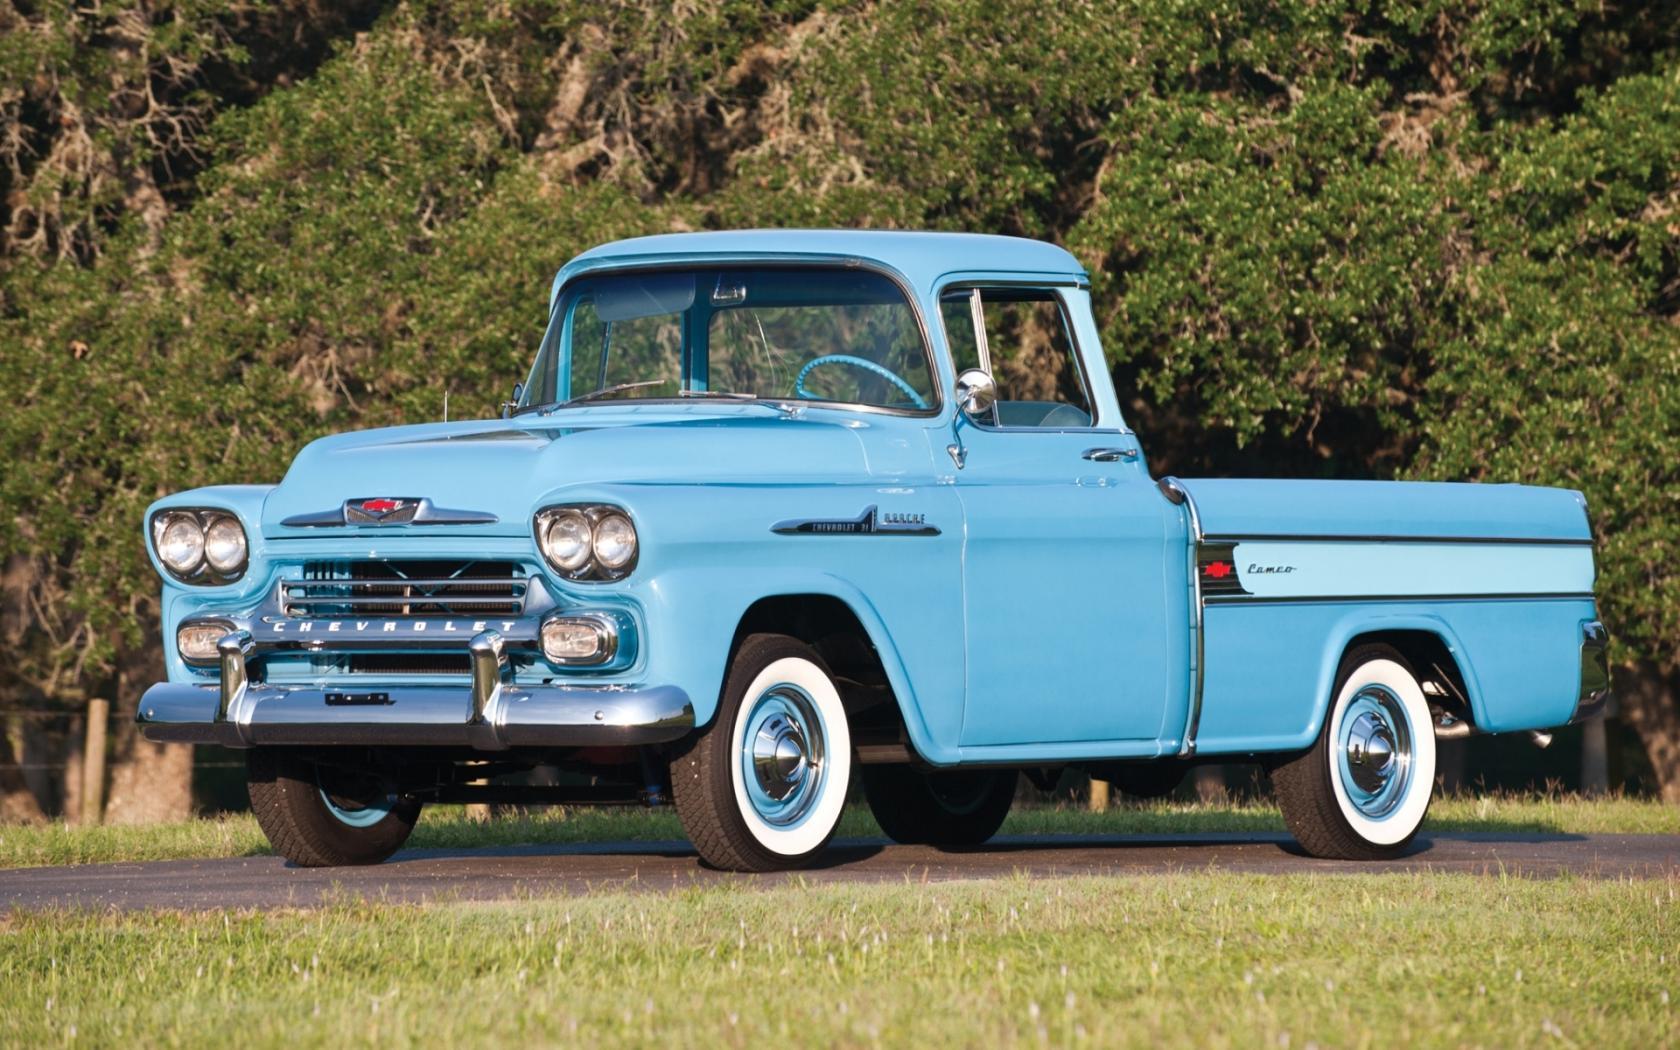 1958 Chevy Cameo Classic Pickup Truck Wallpaper   HD 1680x1050